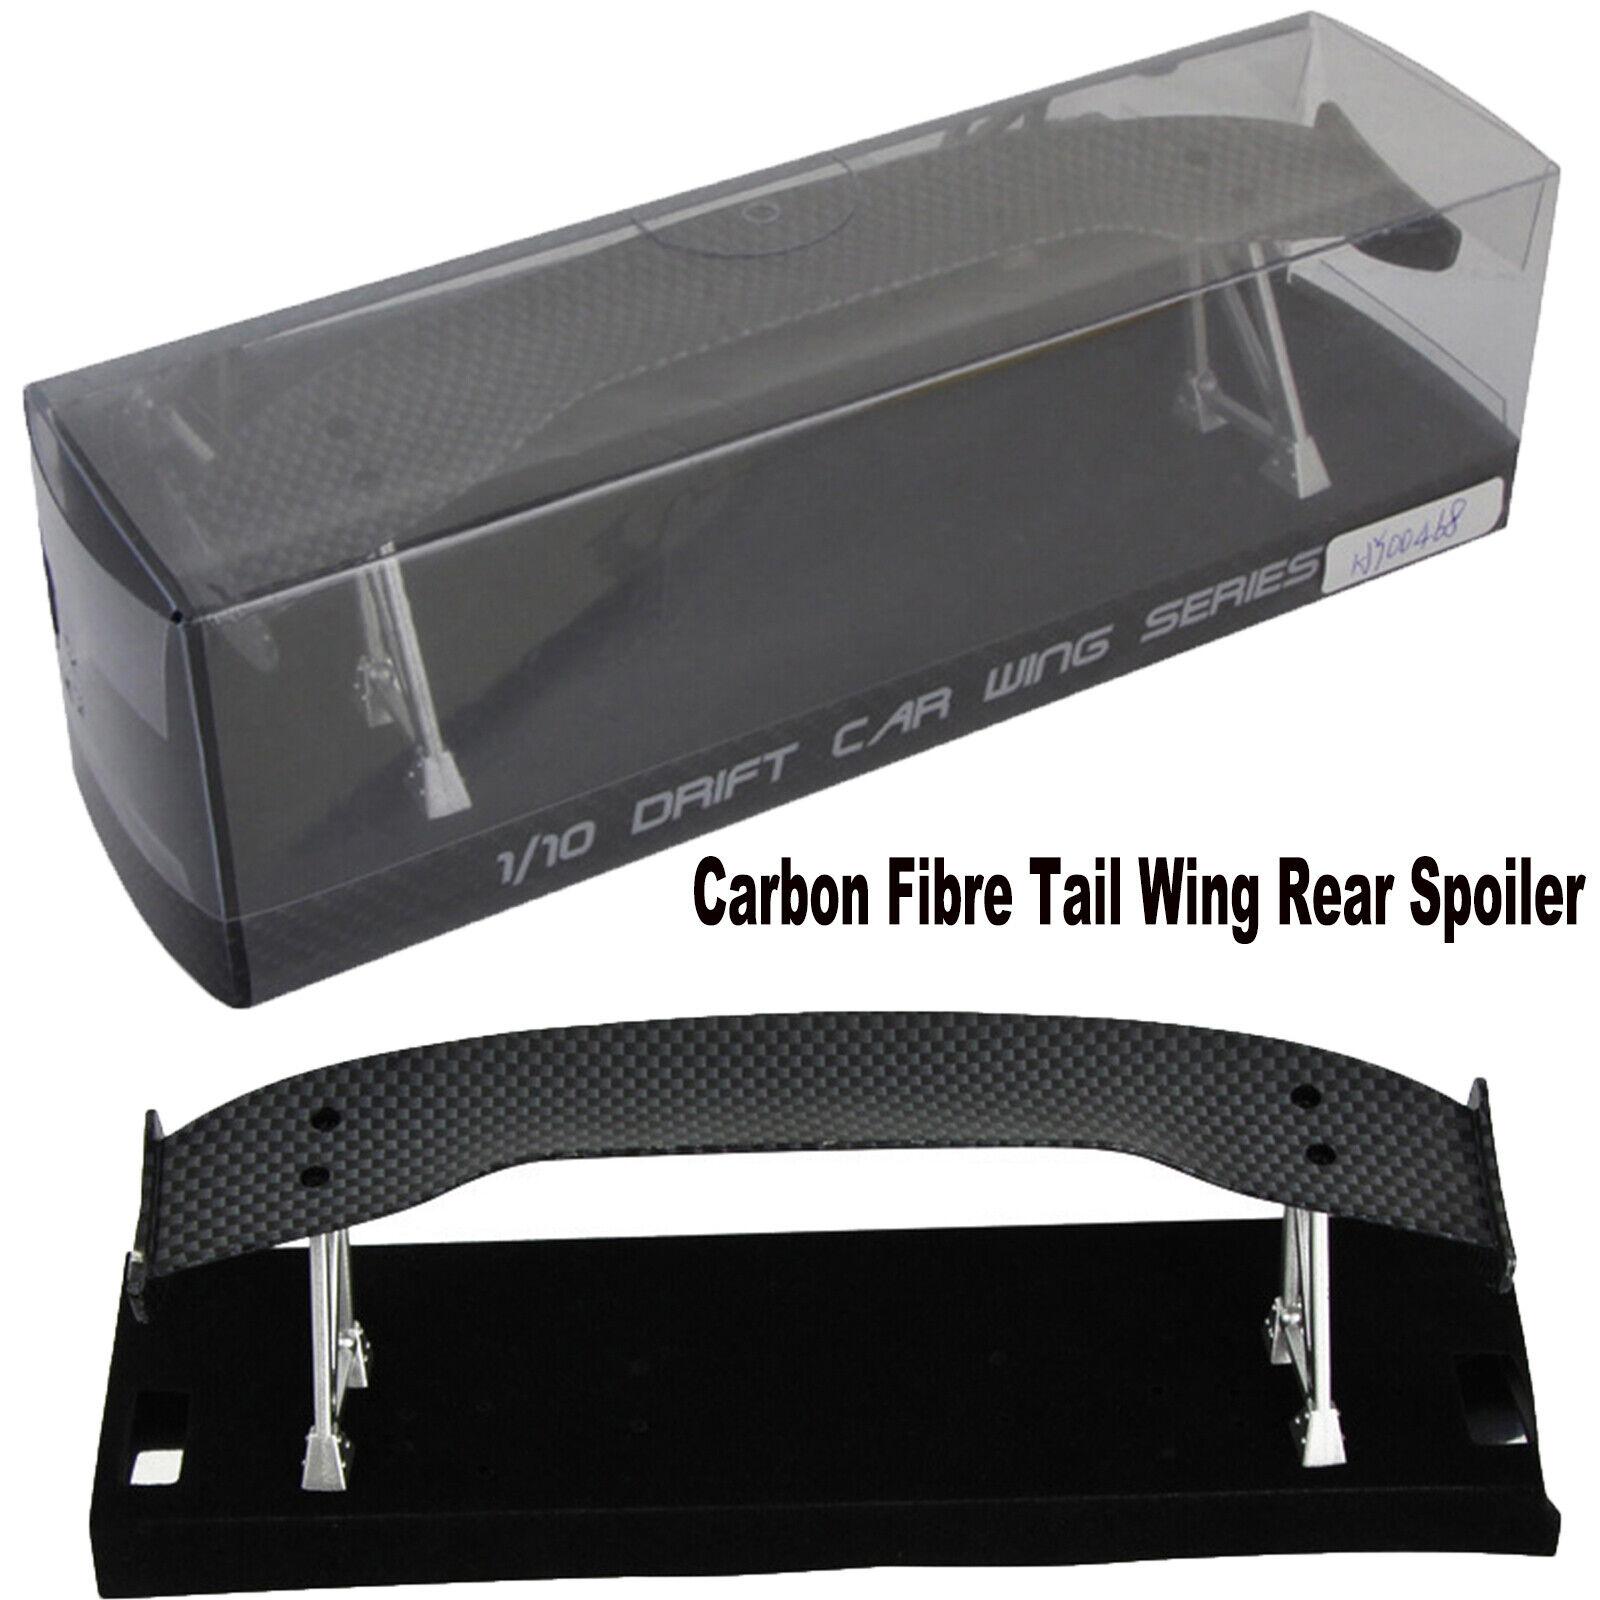 1//10 Carbon Fiber Tail Wing RC Racing Drift On-Road Car GT Rear Spoiler 018002BK